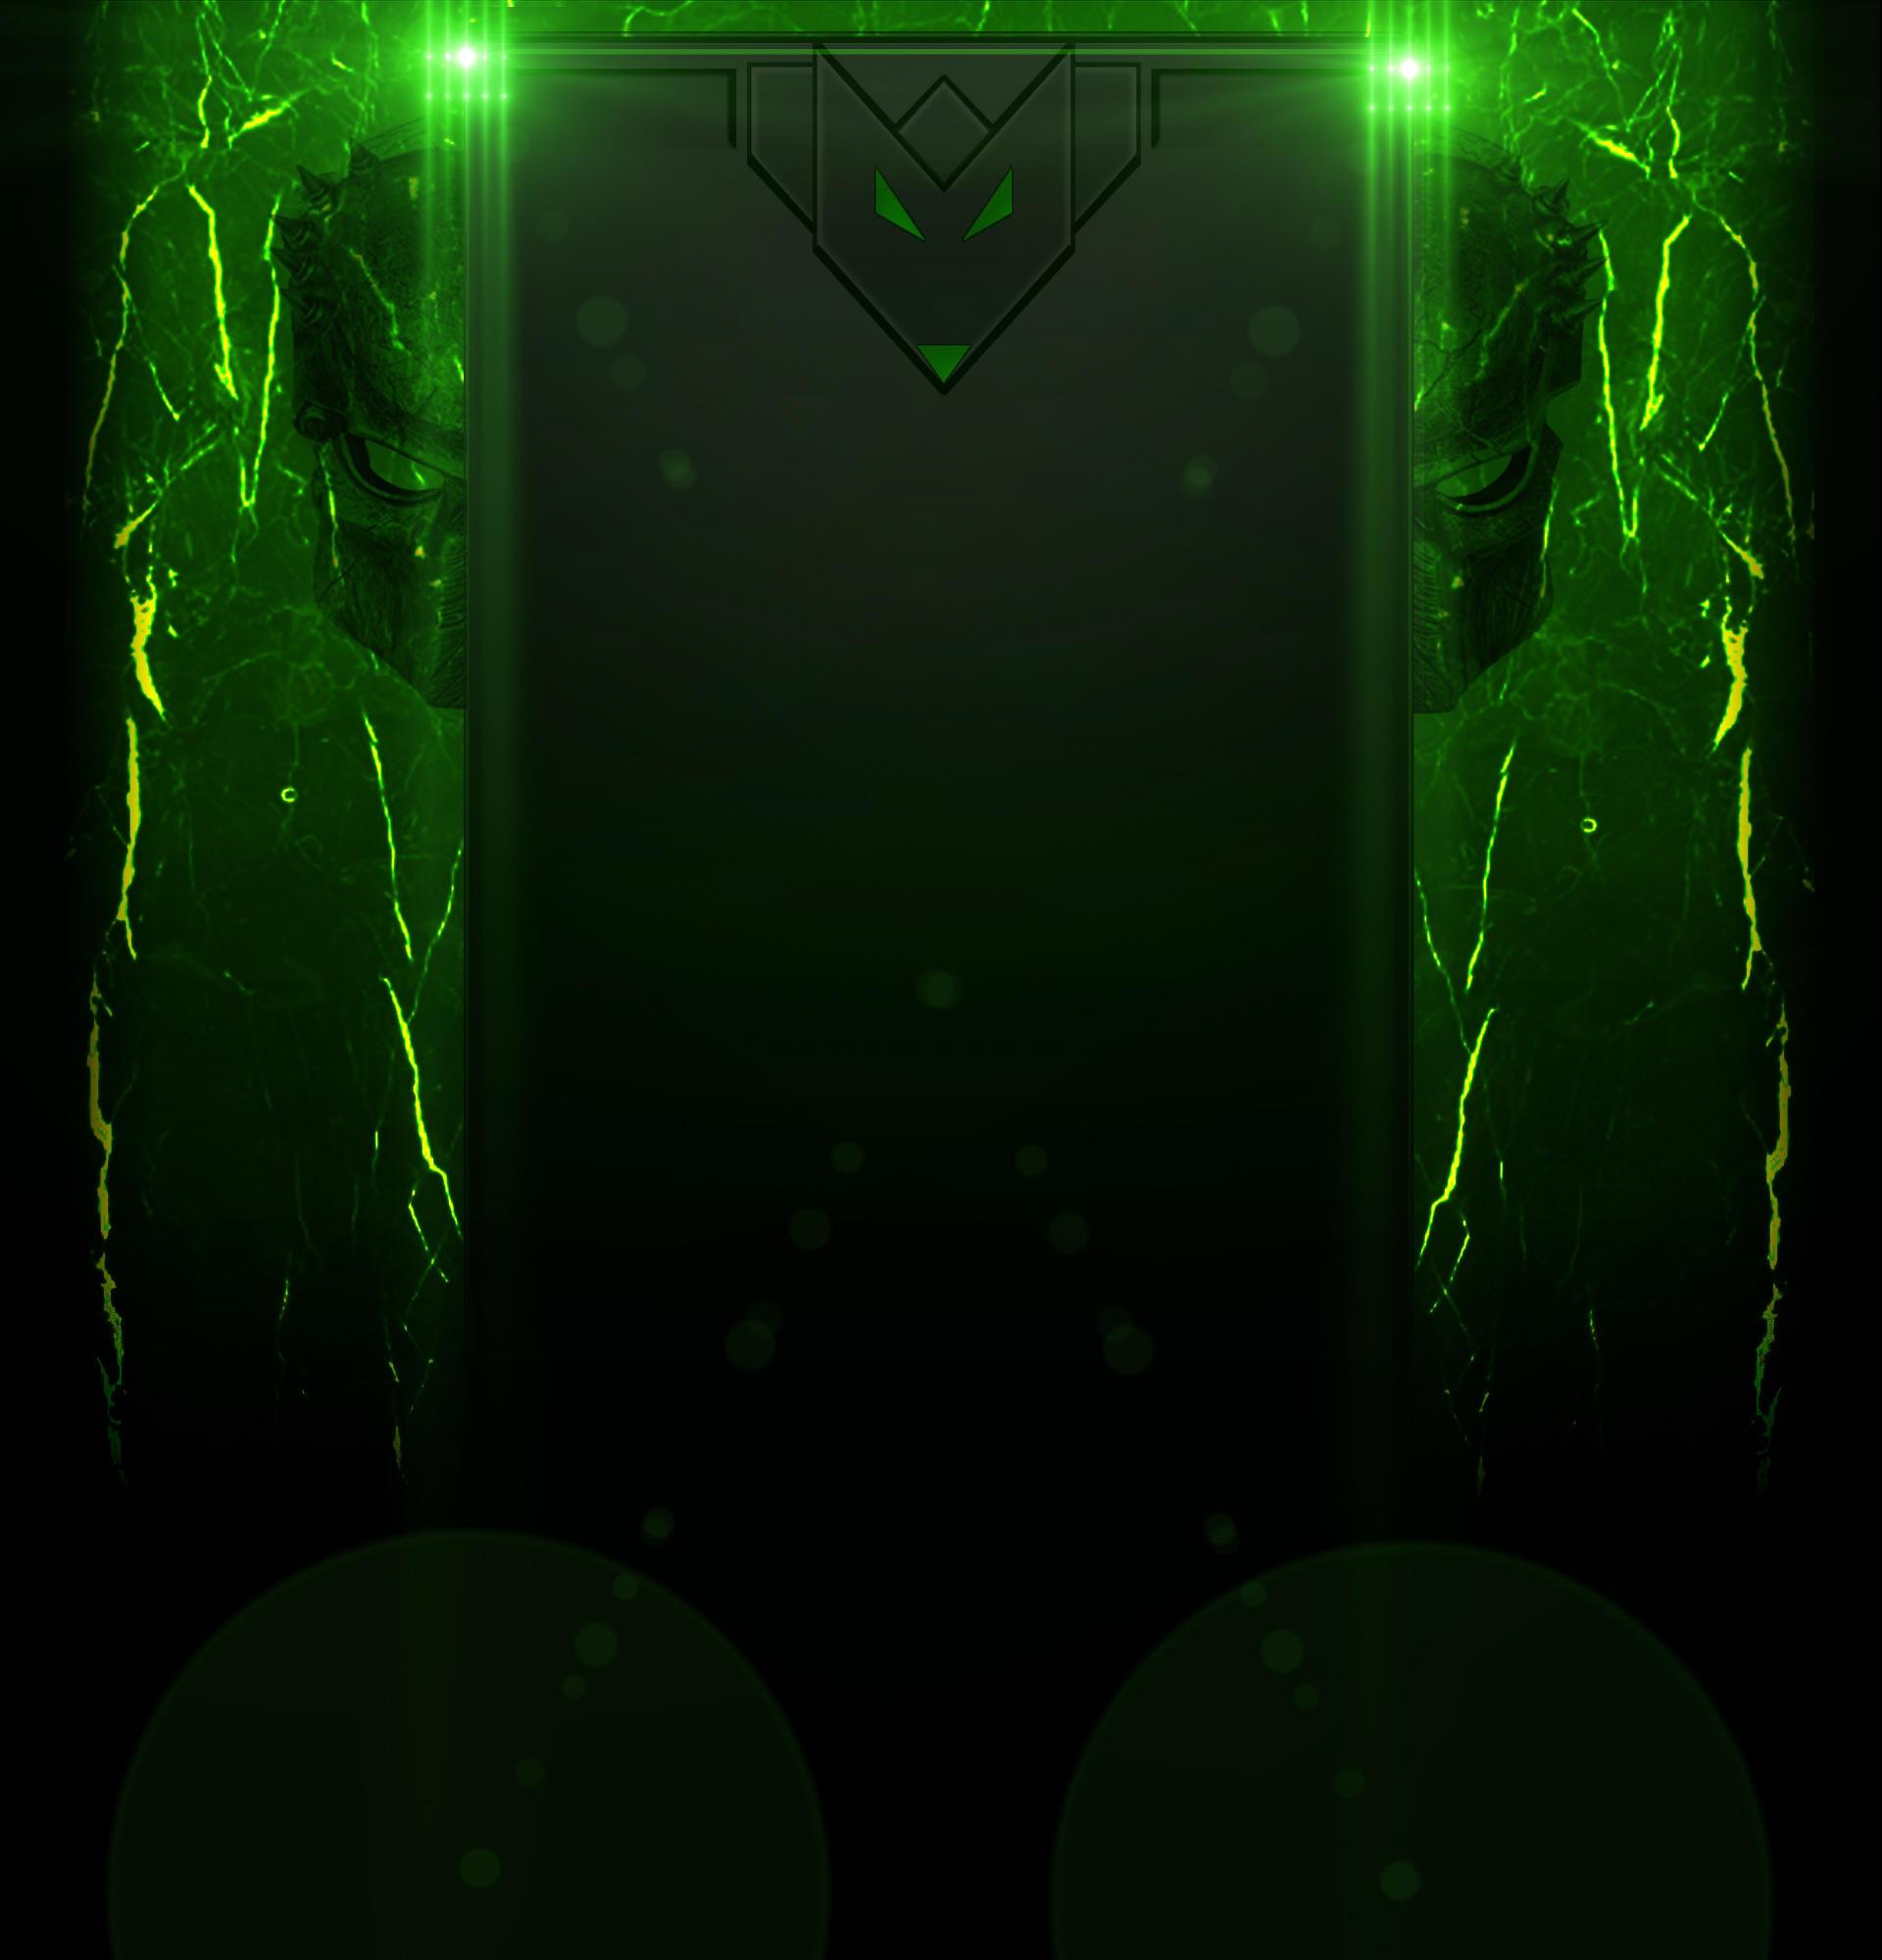 Laser background galleryhip com the hippest galleries - Youtube Background Predator Template By Merunemos Youtube Background Predator Template By Merunemos